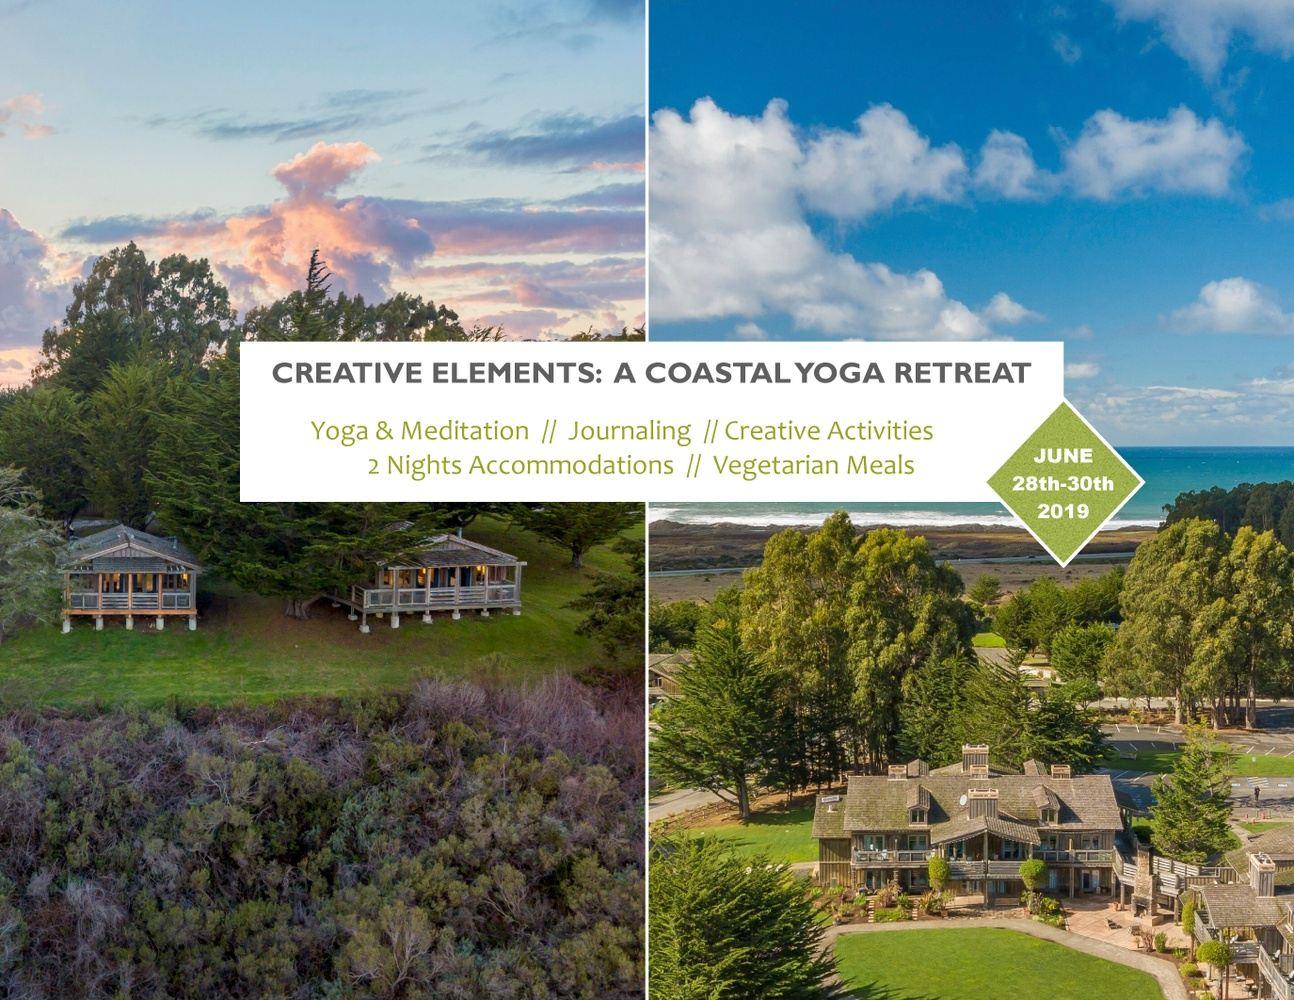 Creative Elements: A Coastal Yoga Retreat